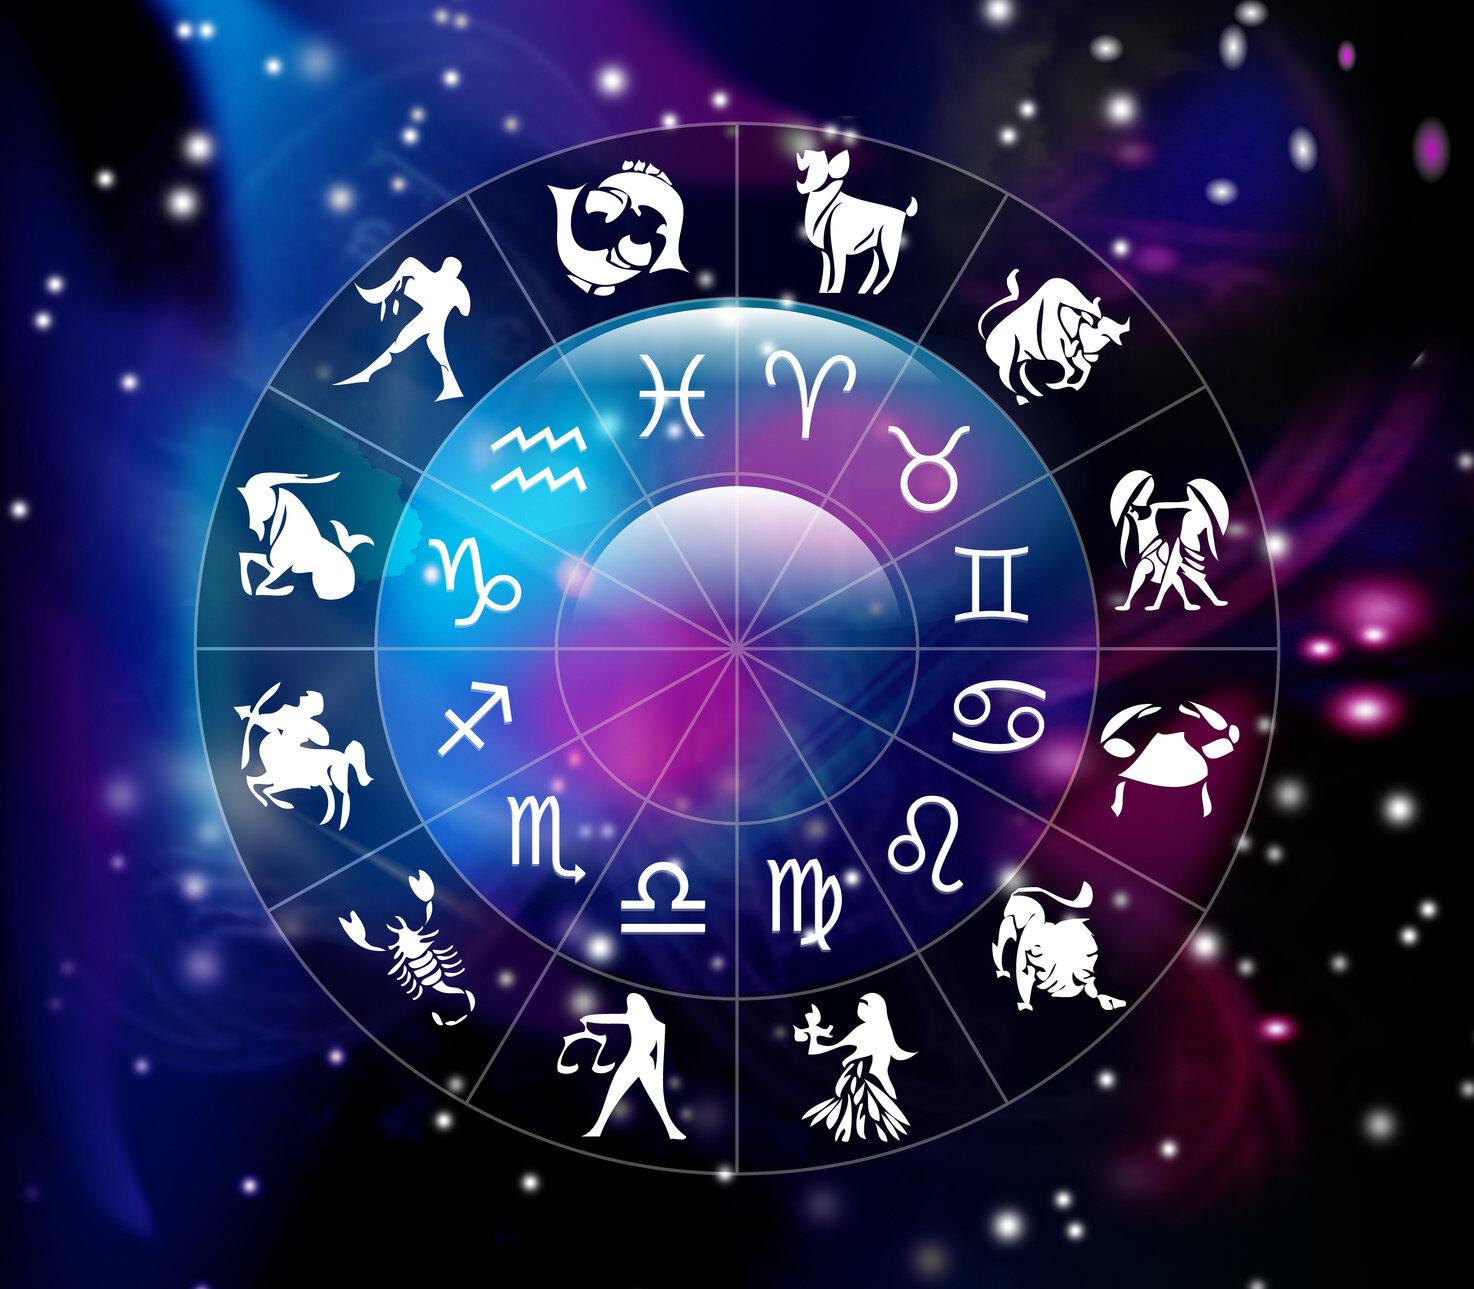 Oroscopo astrologia segni zodiacali